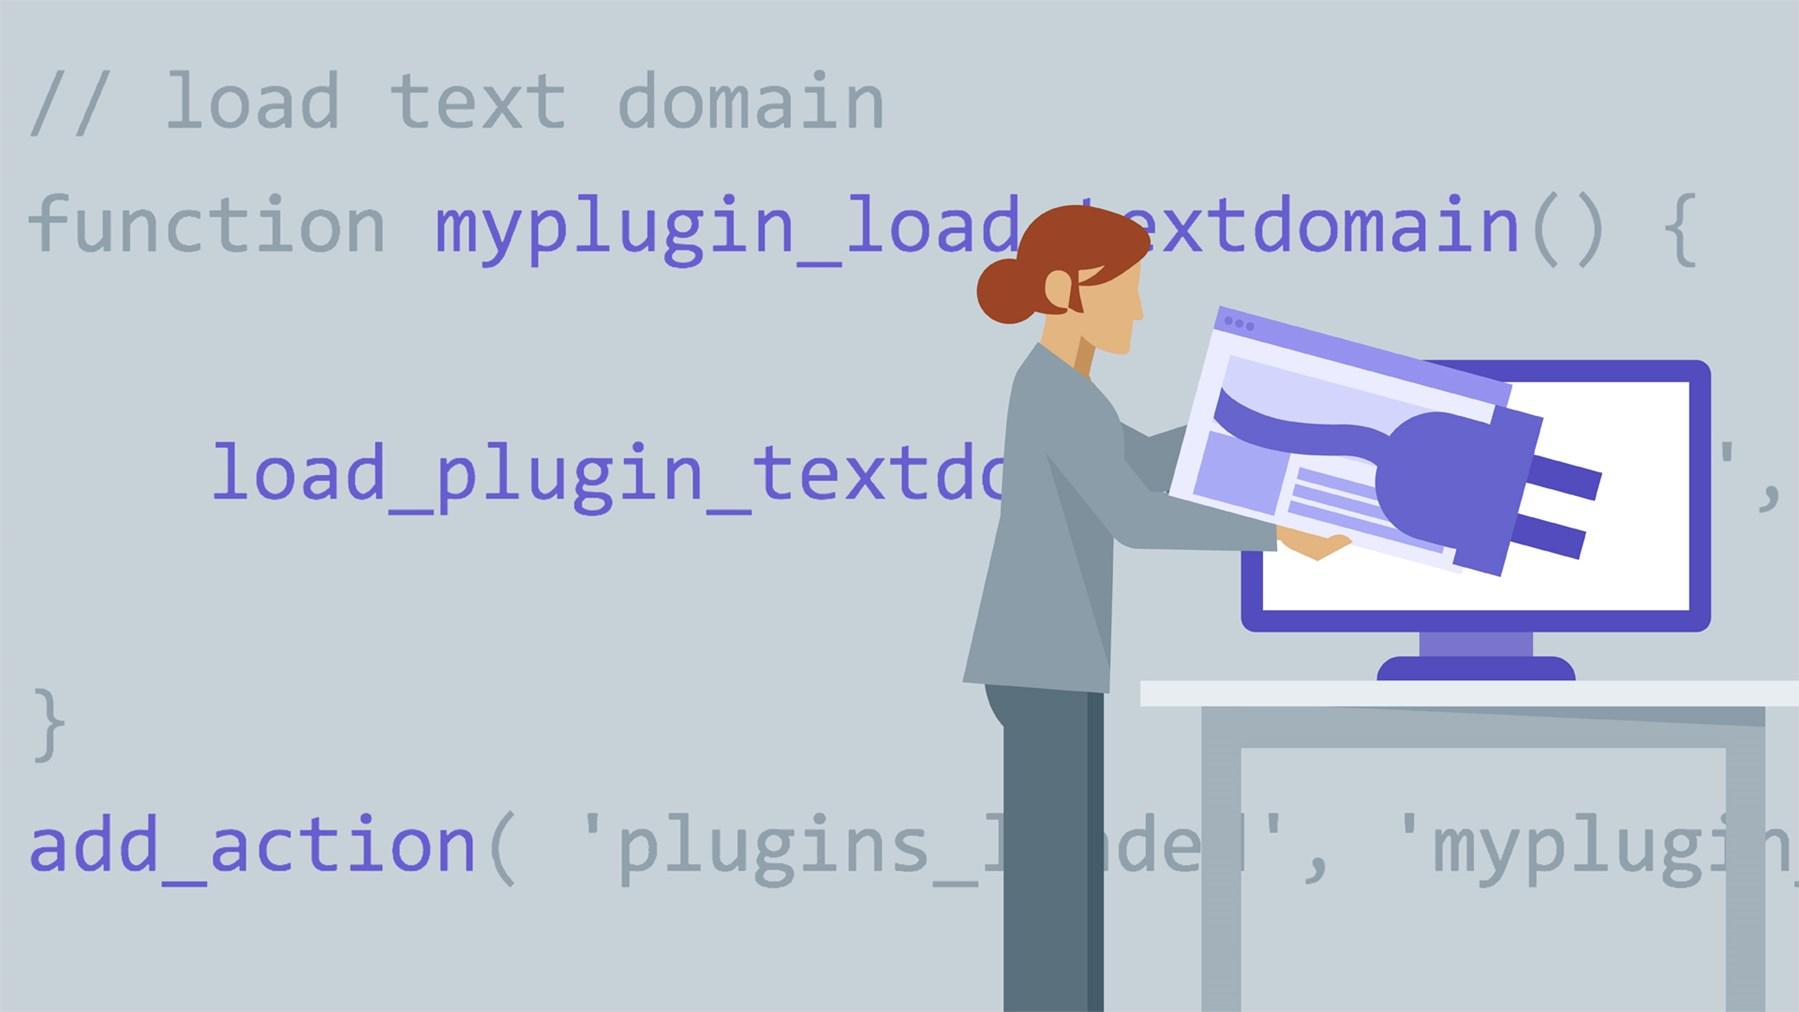 https://www lynda com/IT-tutorials/role-service-level